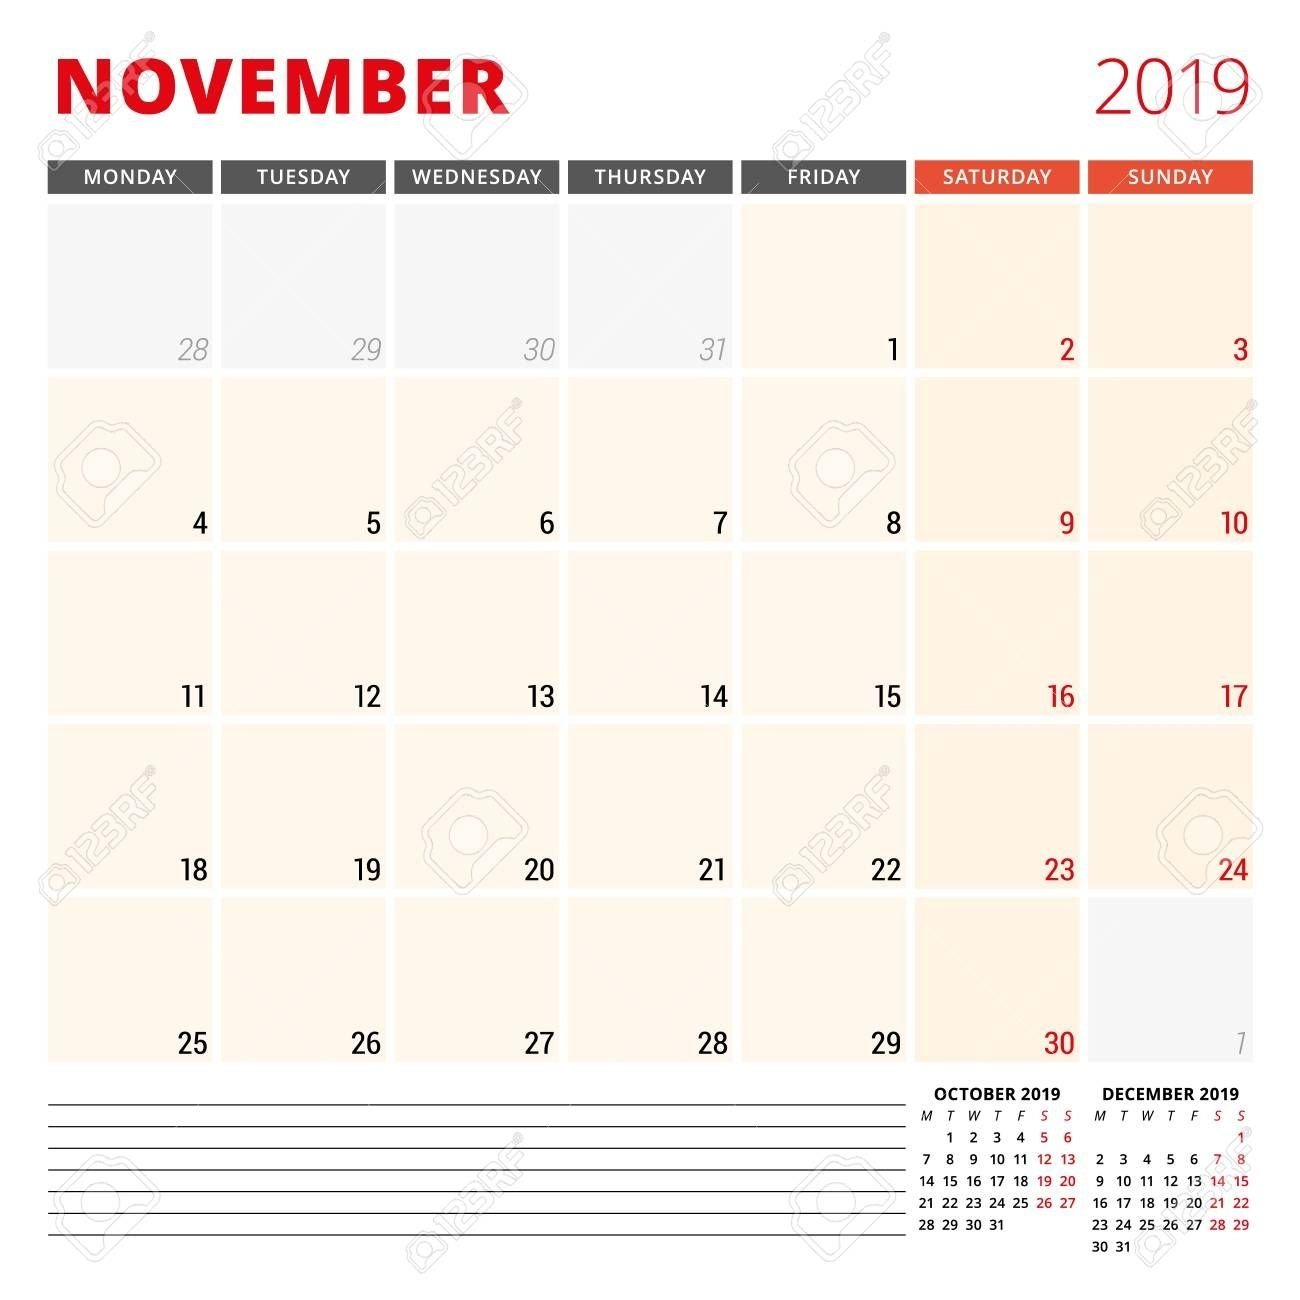 Calendar Planner Template For November 2019. Week Starts One Week Monday Through Saturday Communication Calendar